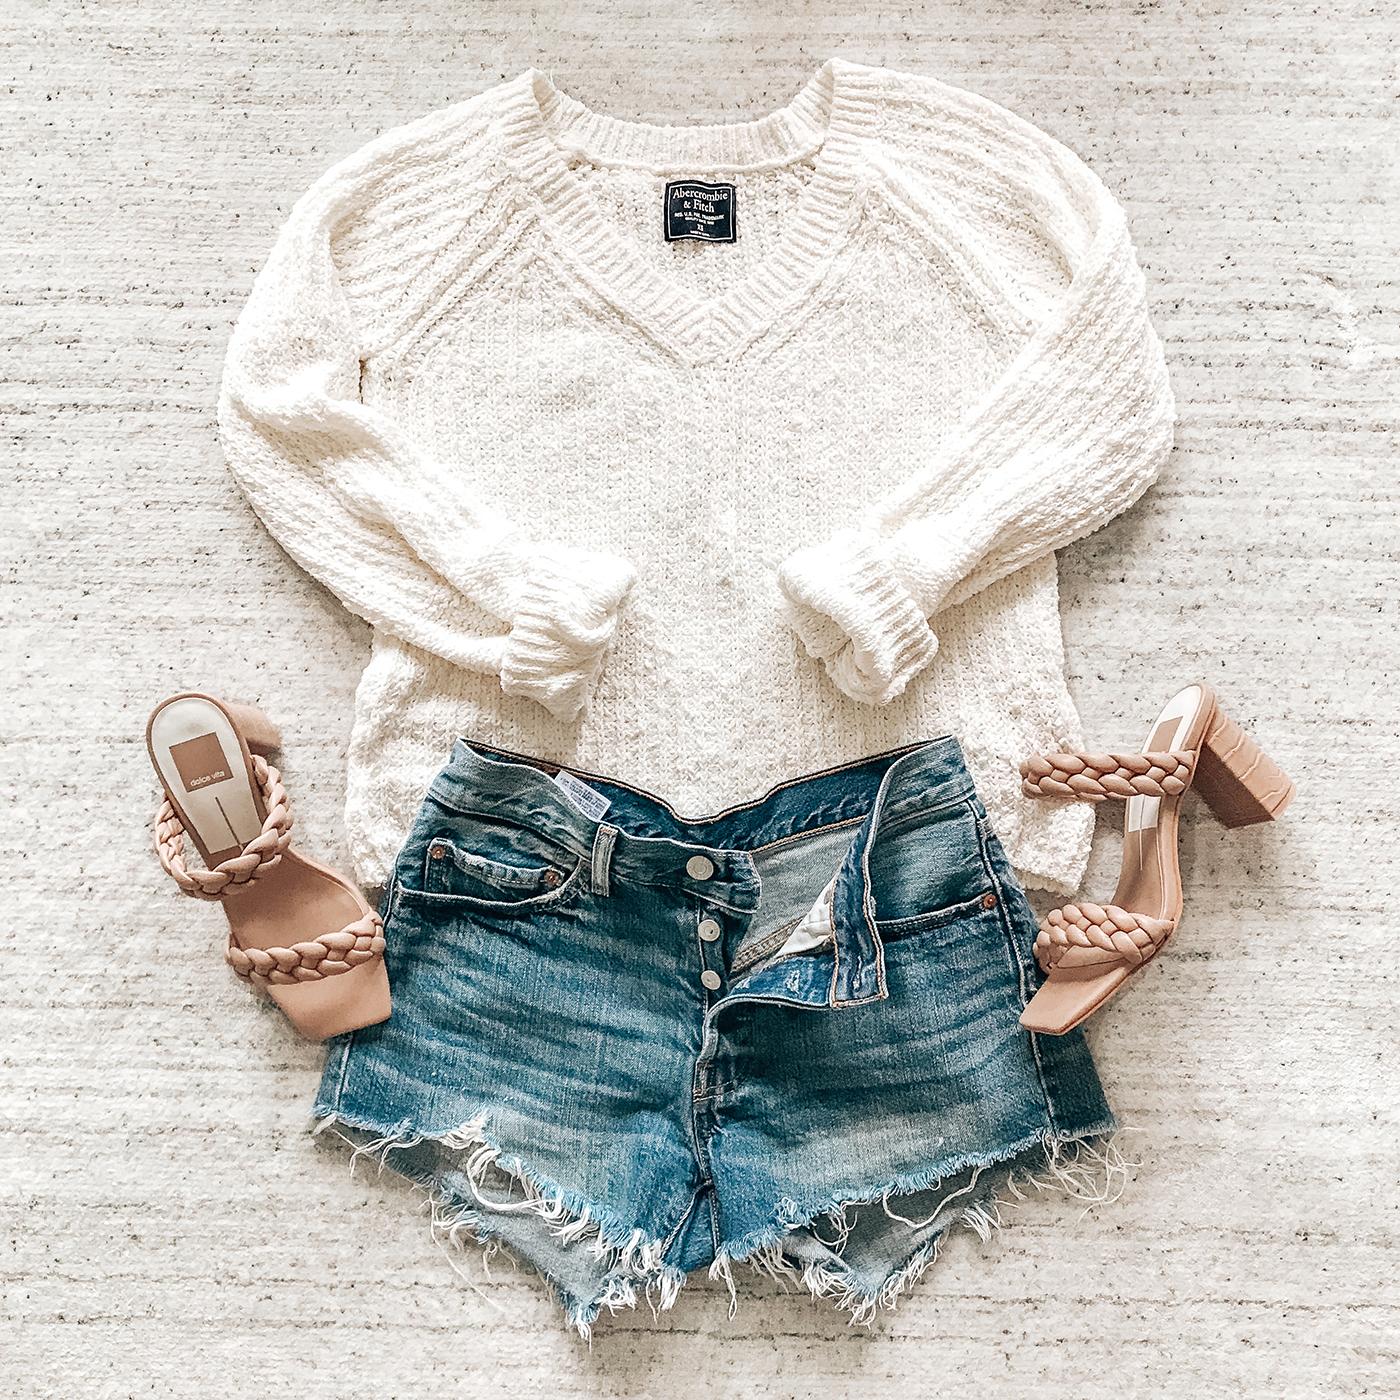 summer denim high rise cut off levi's shorts, abercrombie sweater, dolce vita braided sandals